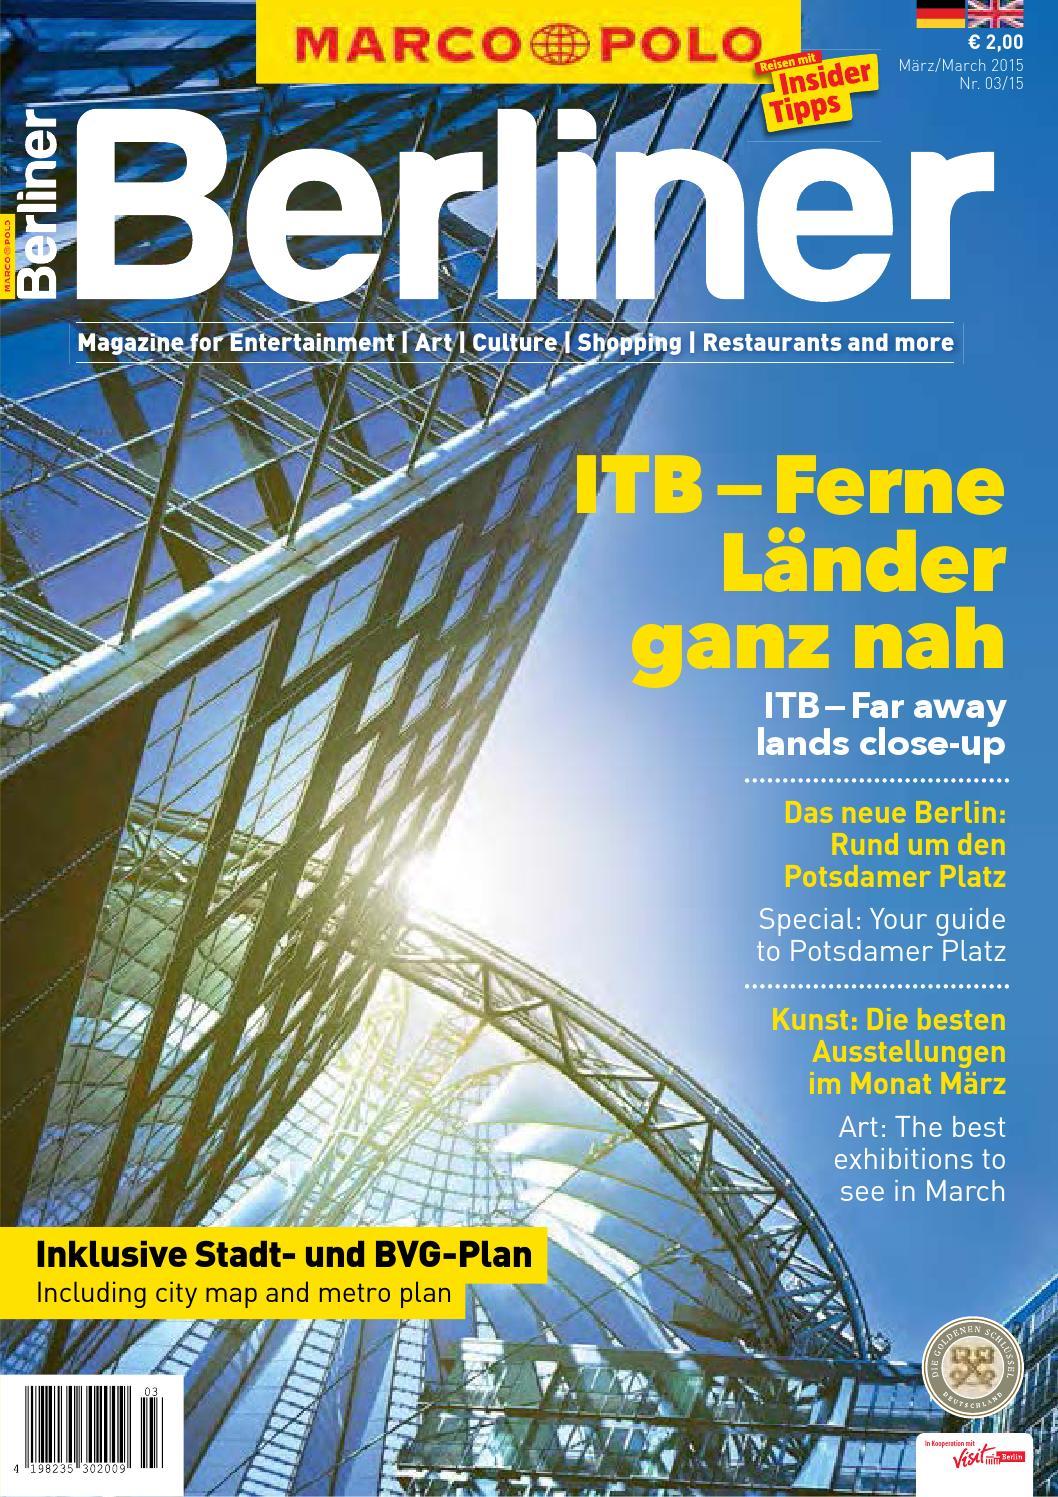 MARCO POLO Berliner 02/15 by Berlin Medien GmbH - issuu